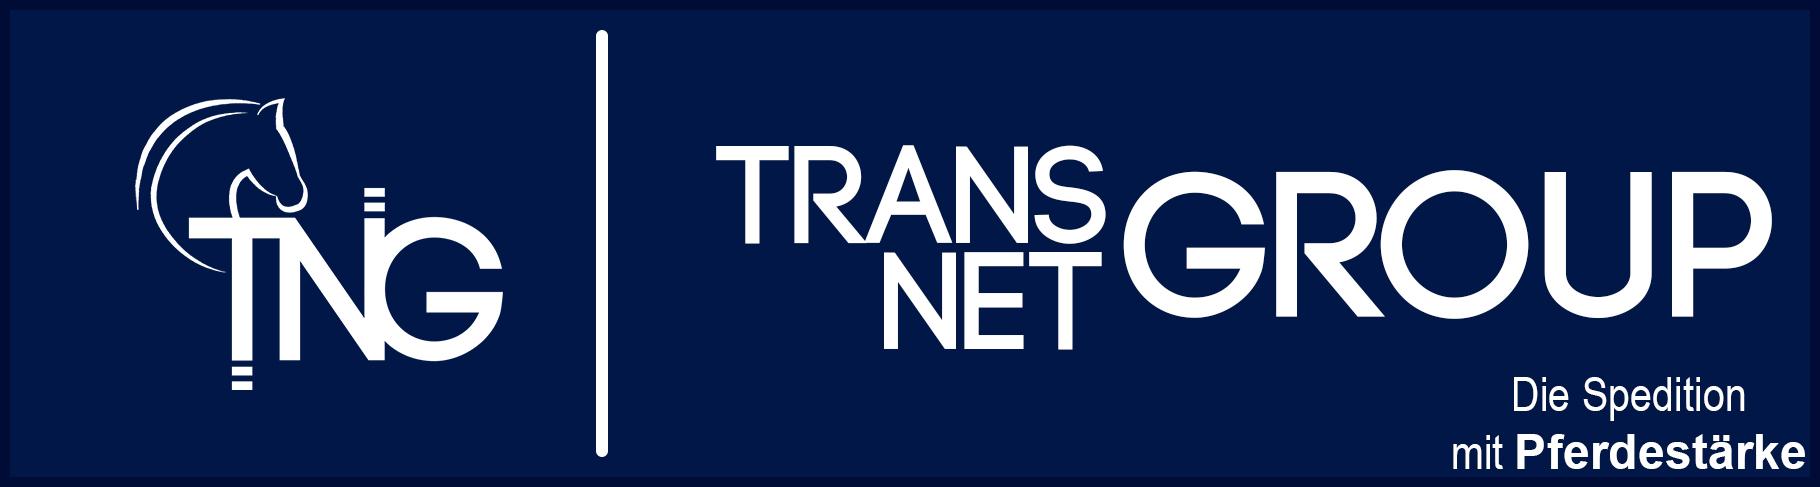 TransNet Group